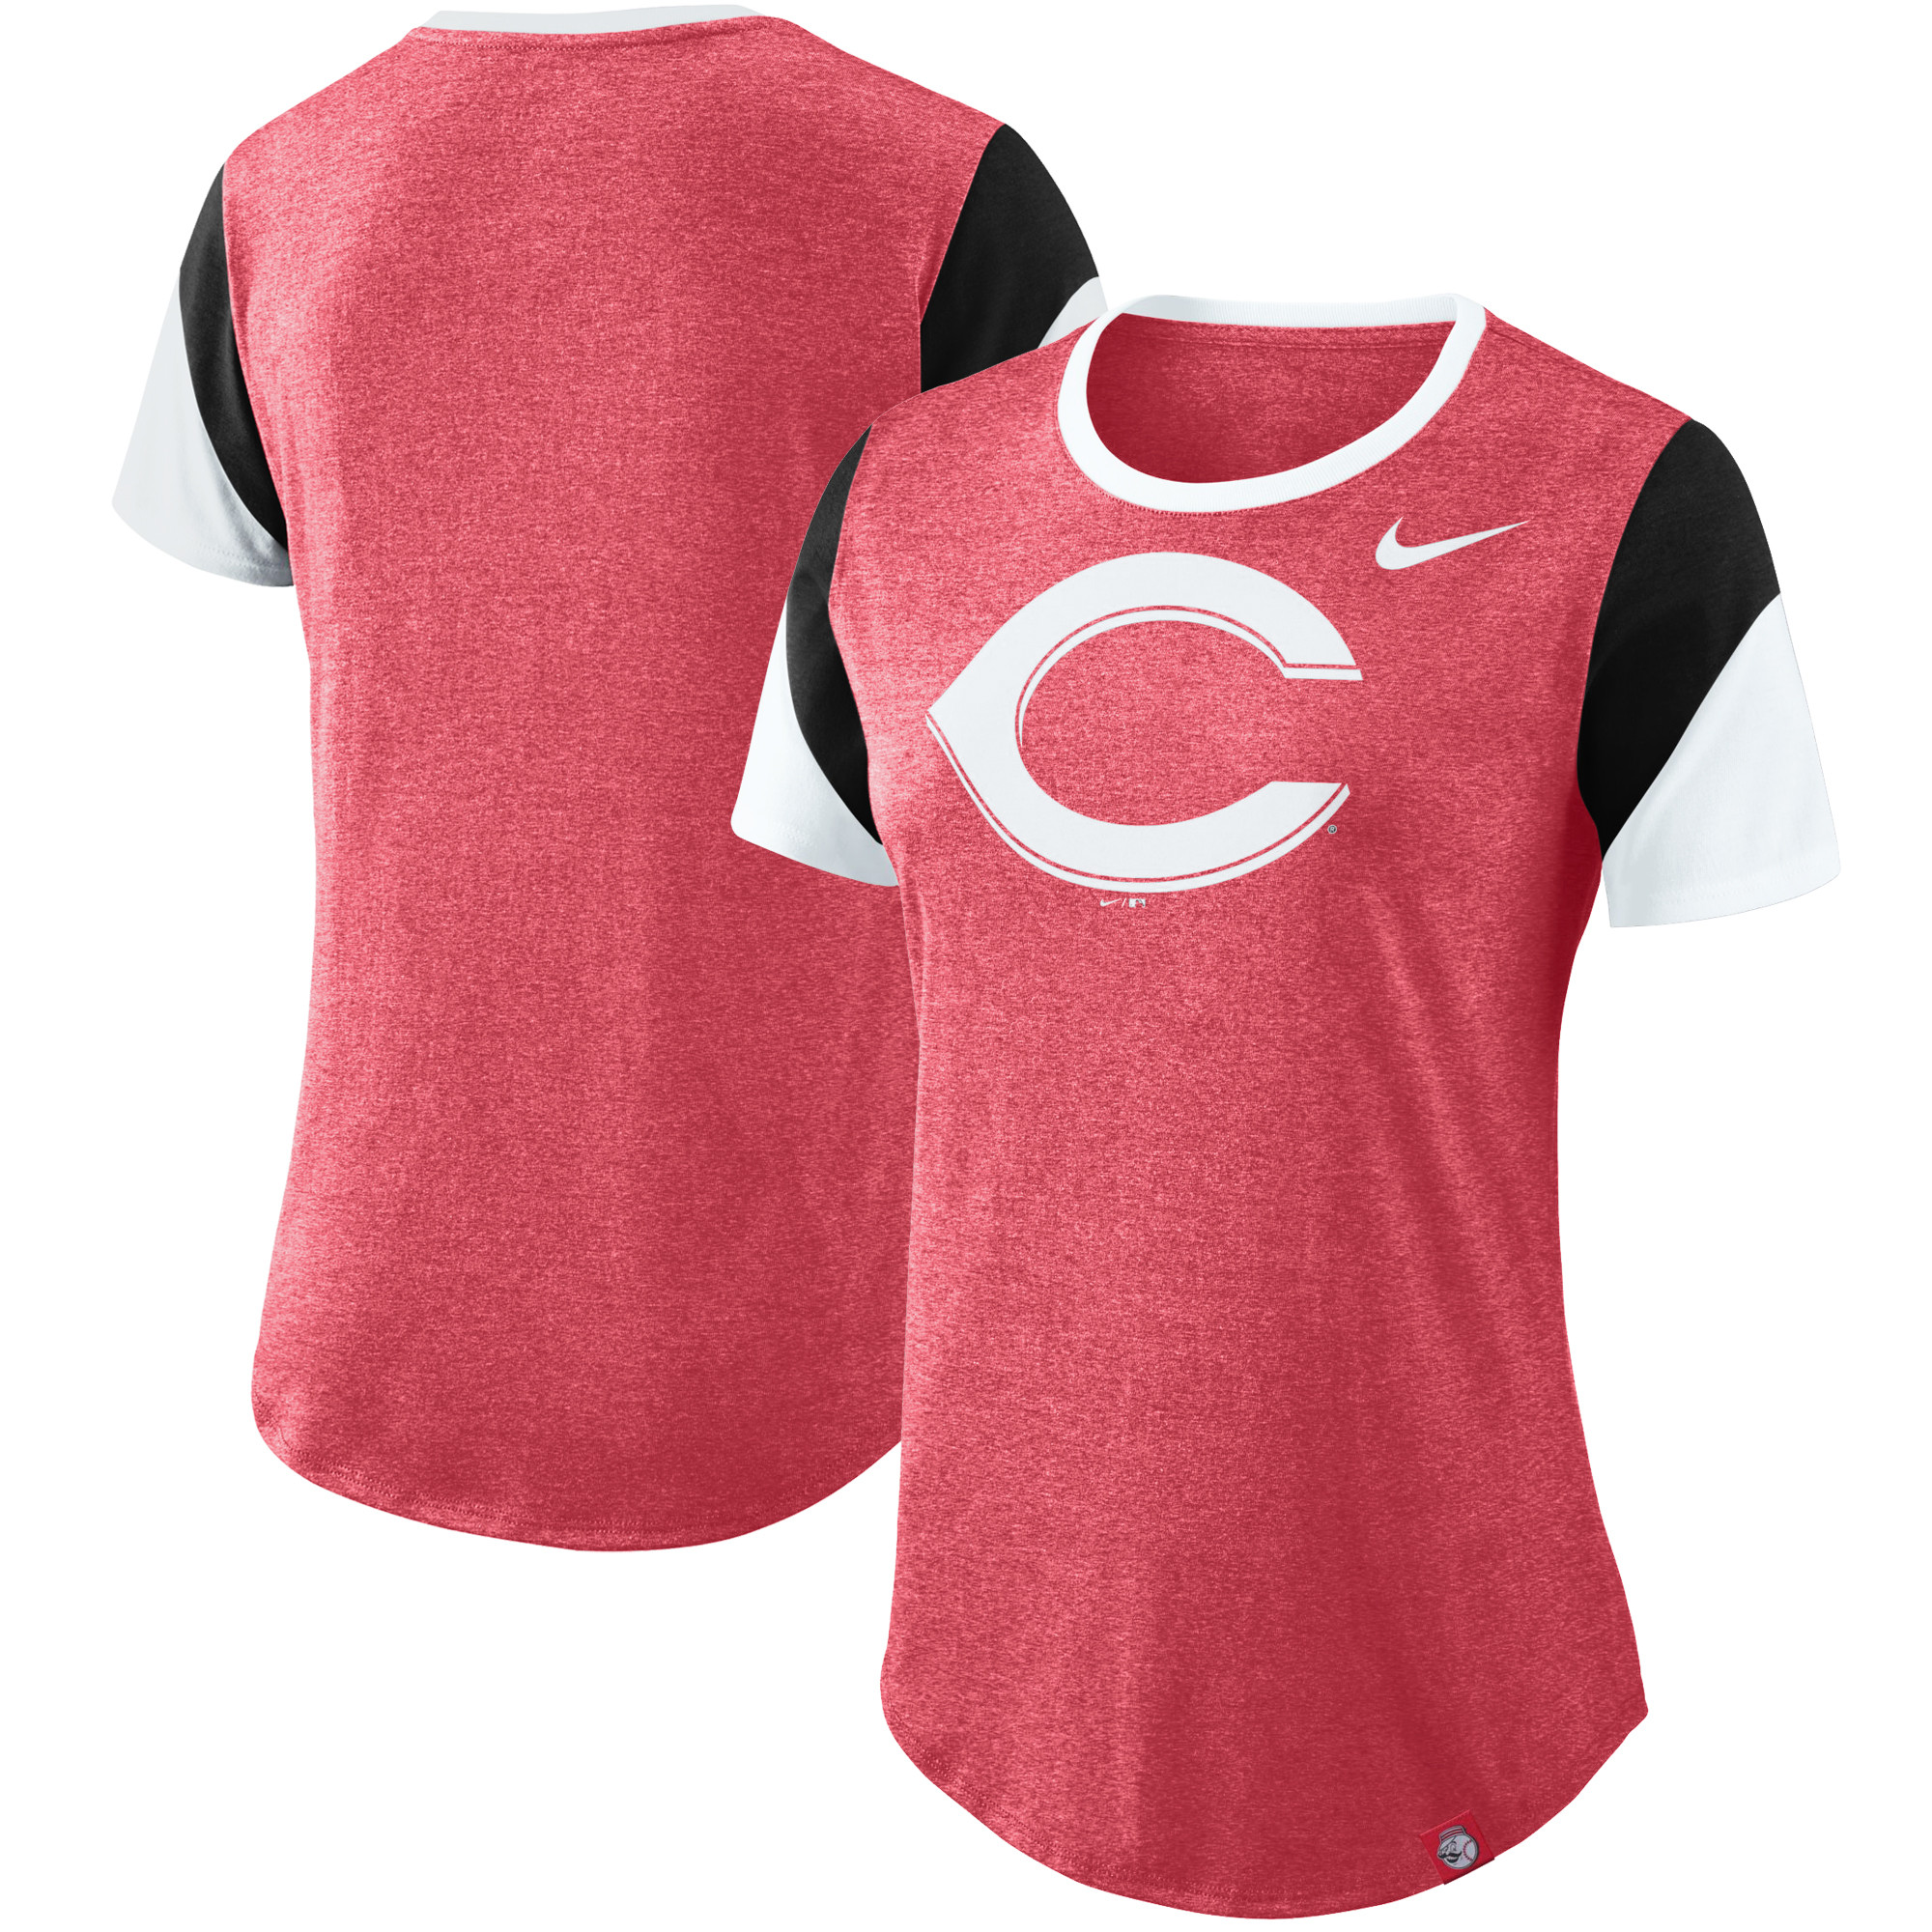 Cincinnati Reds Nike Women's Sleeve Stripes Tri-Blend T-Shirt - Red